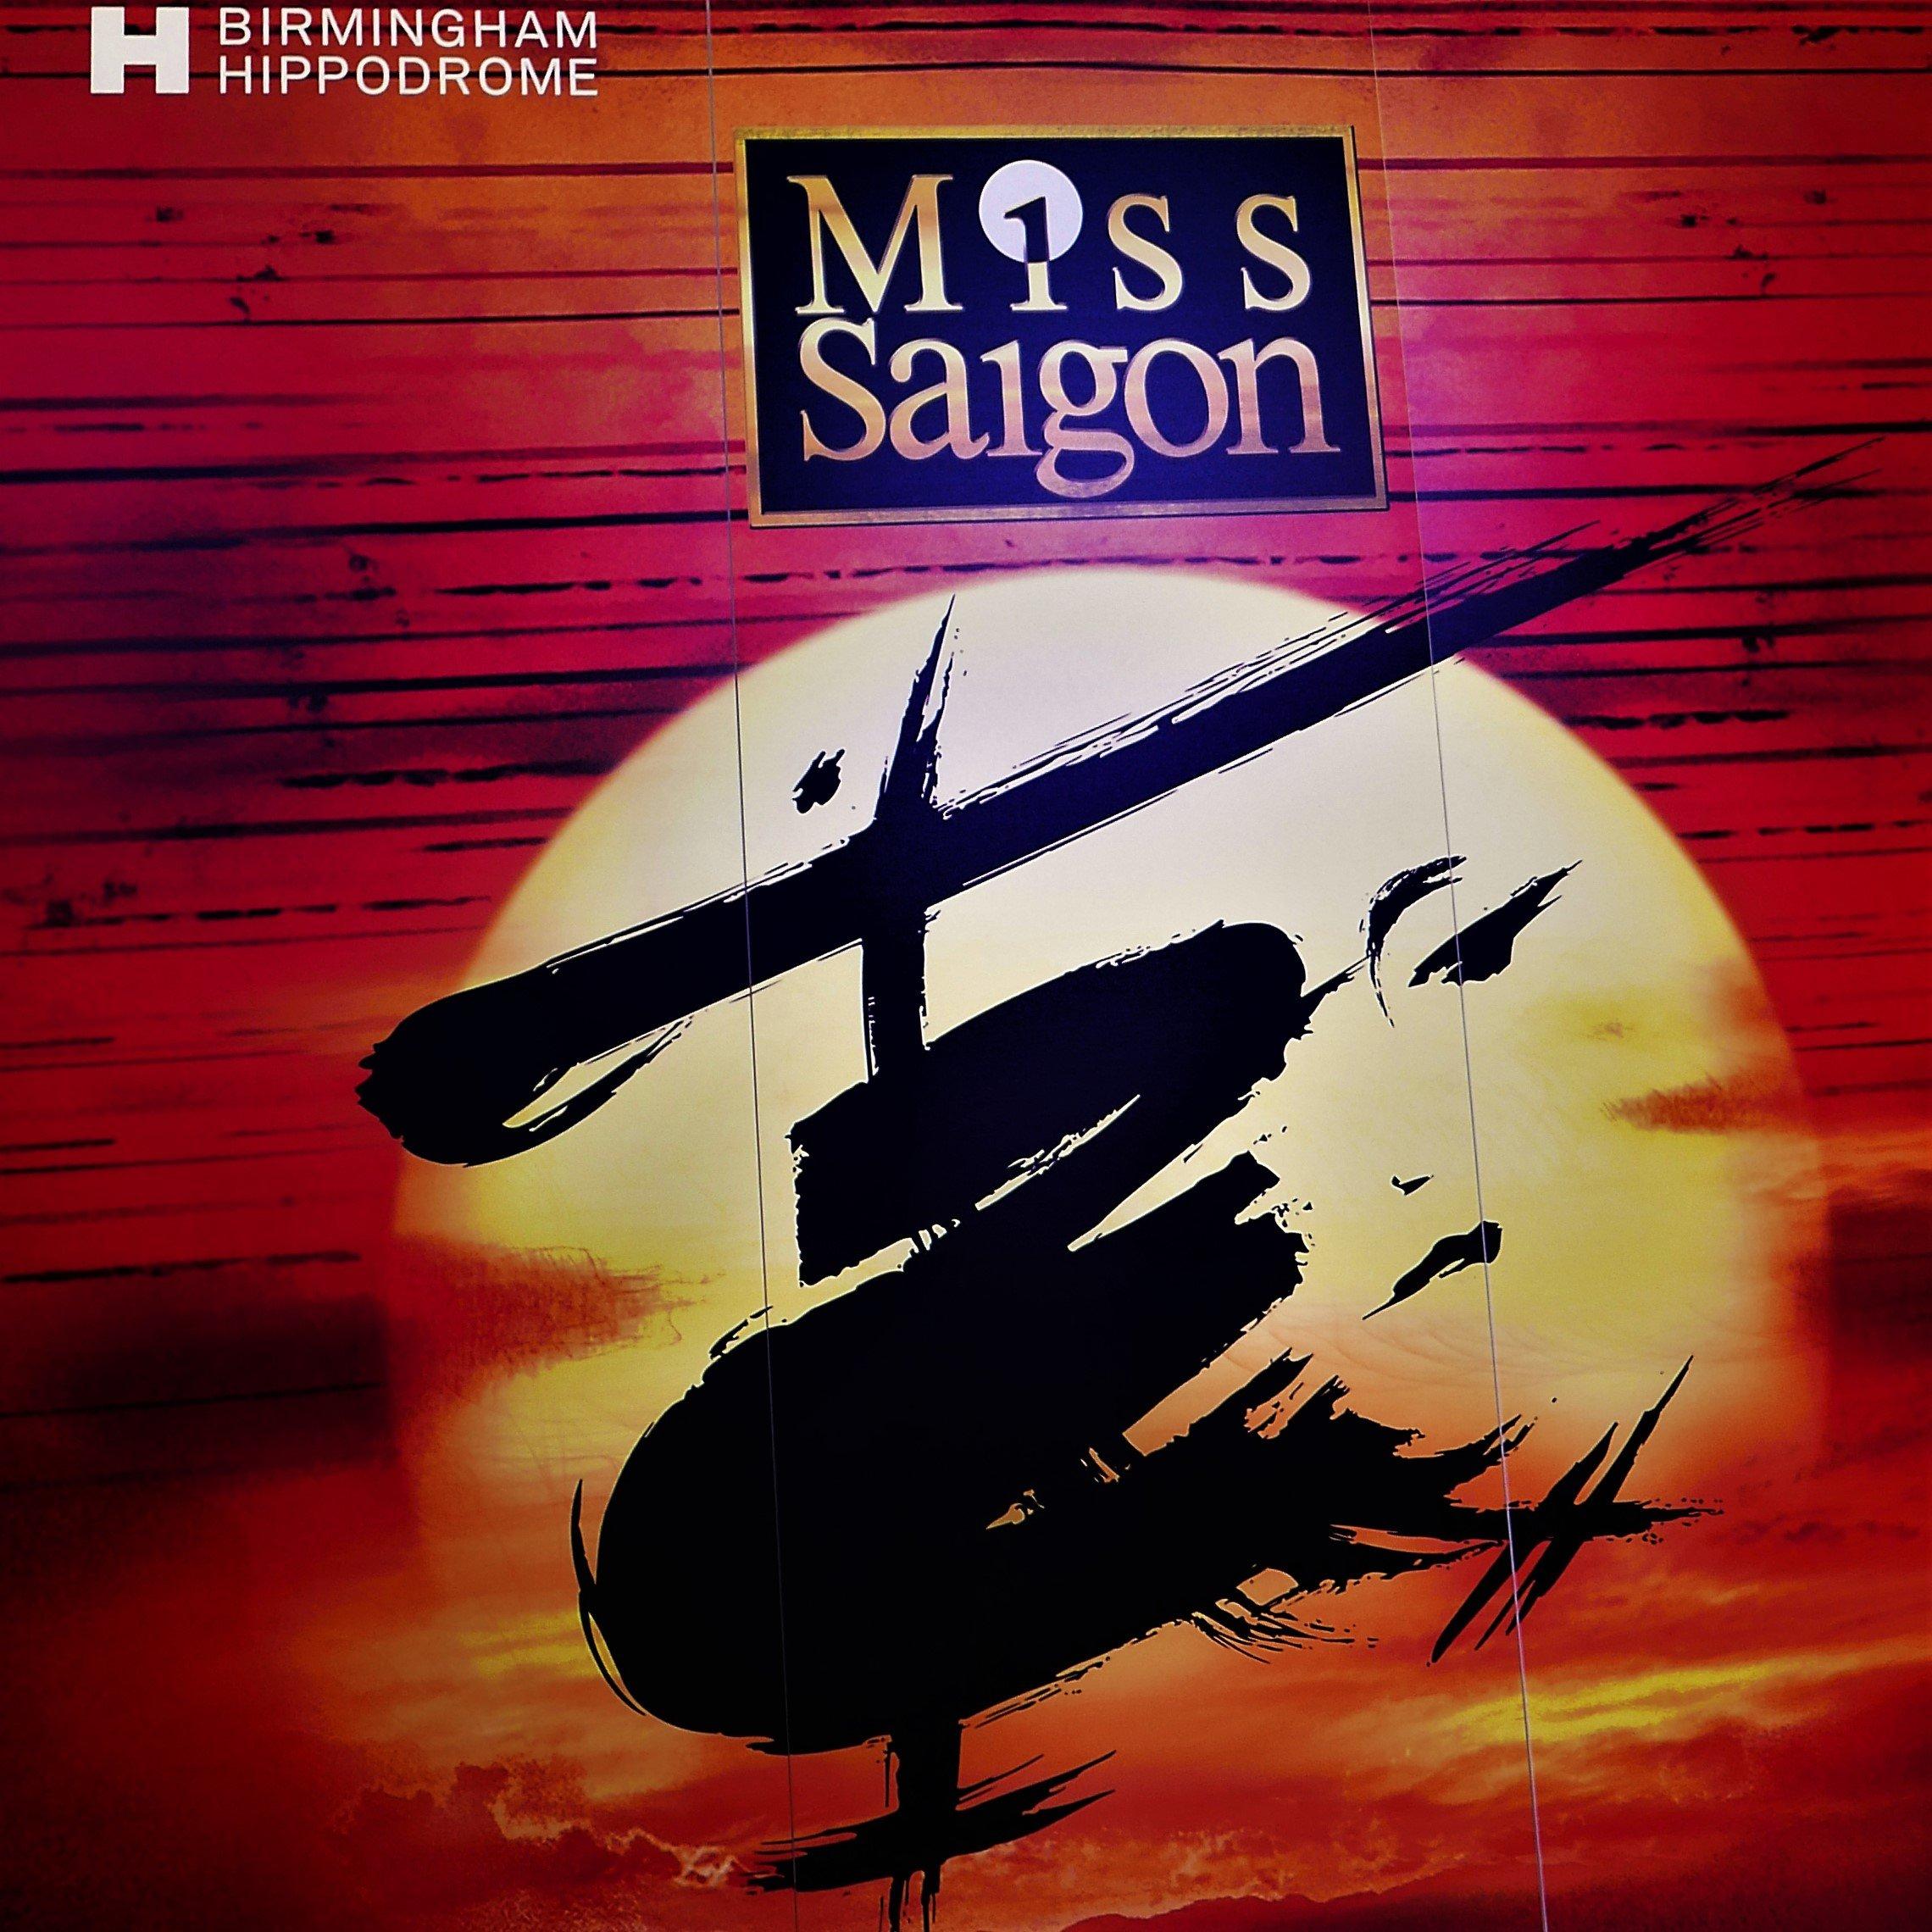 Birmingham Hippodrome invited Brum Bloggers along to sample their new Miss Saigon inspired summer menu...